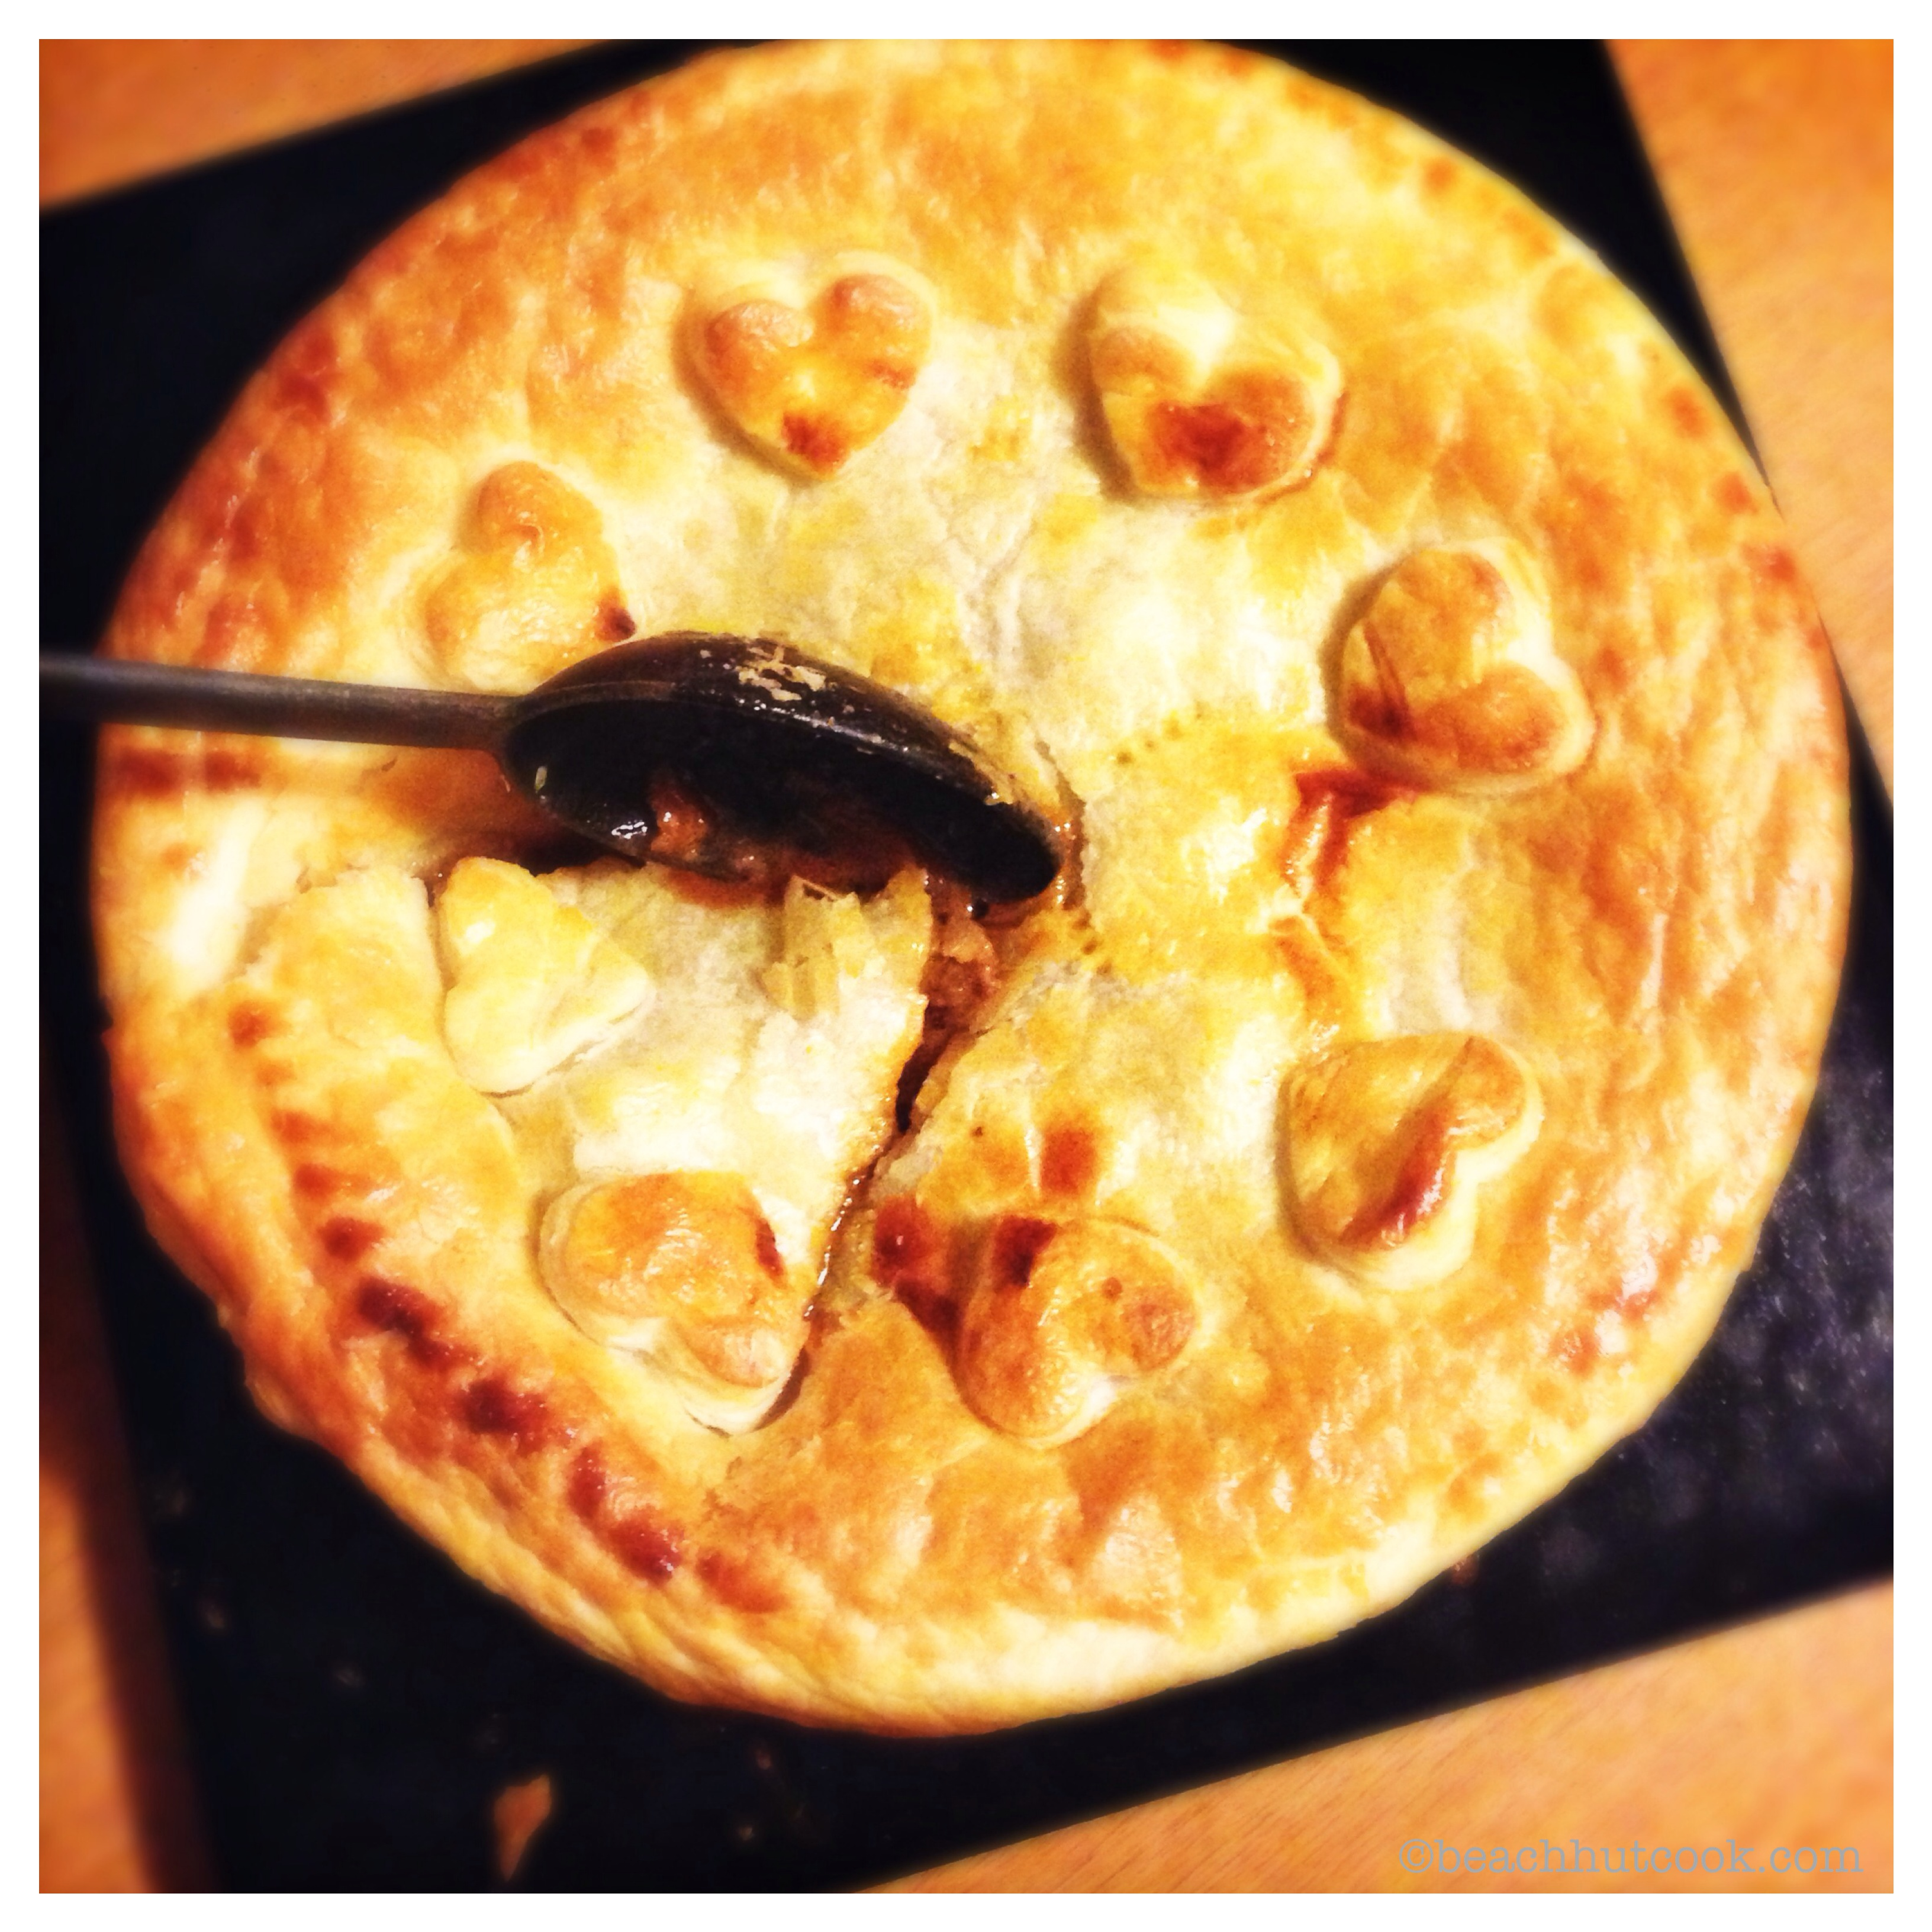 Easiest Dinner Party Menu Ever by Beachhutcook. Beef & Stout Pie